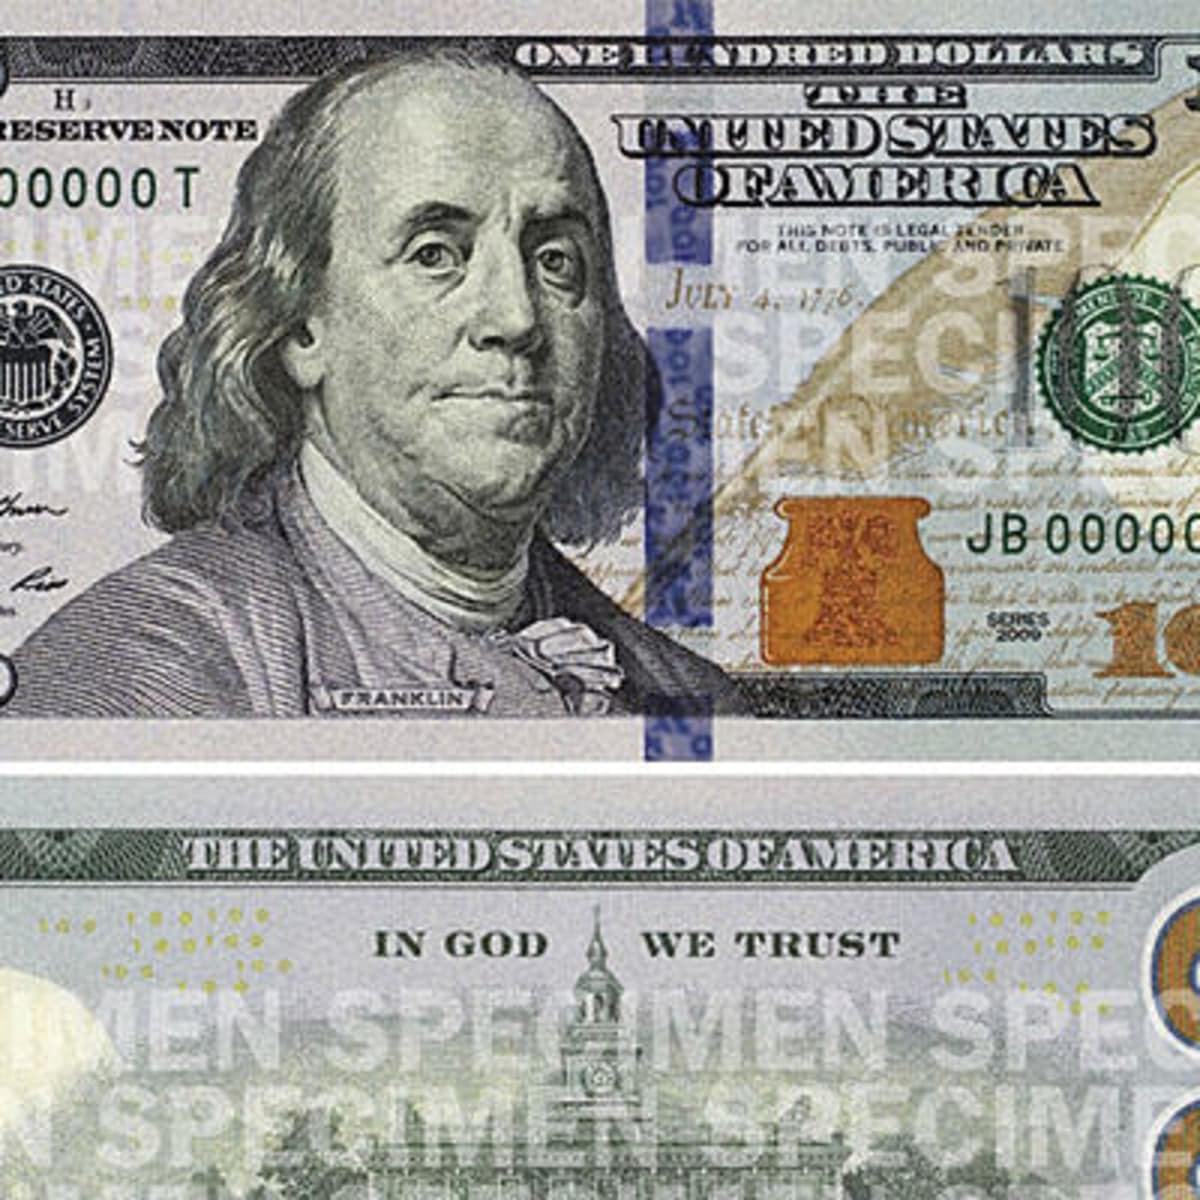 New $100 bill wider